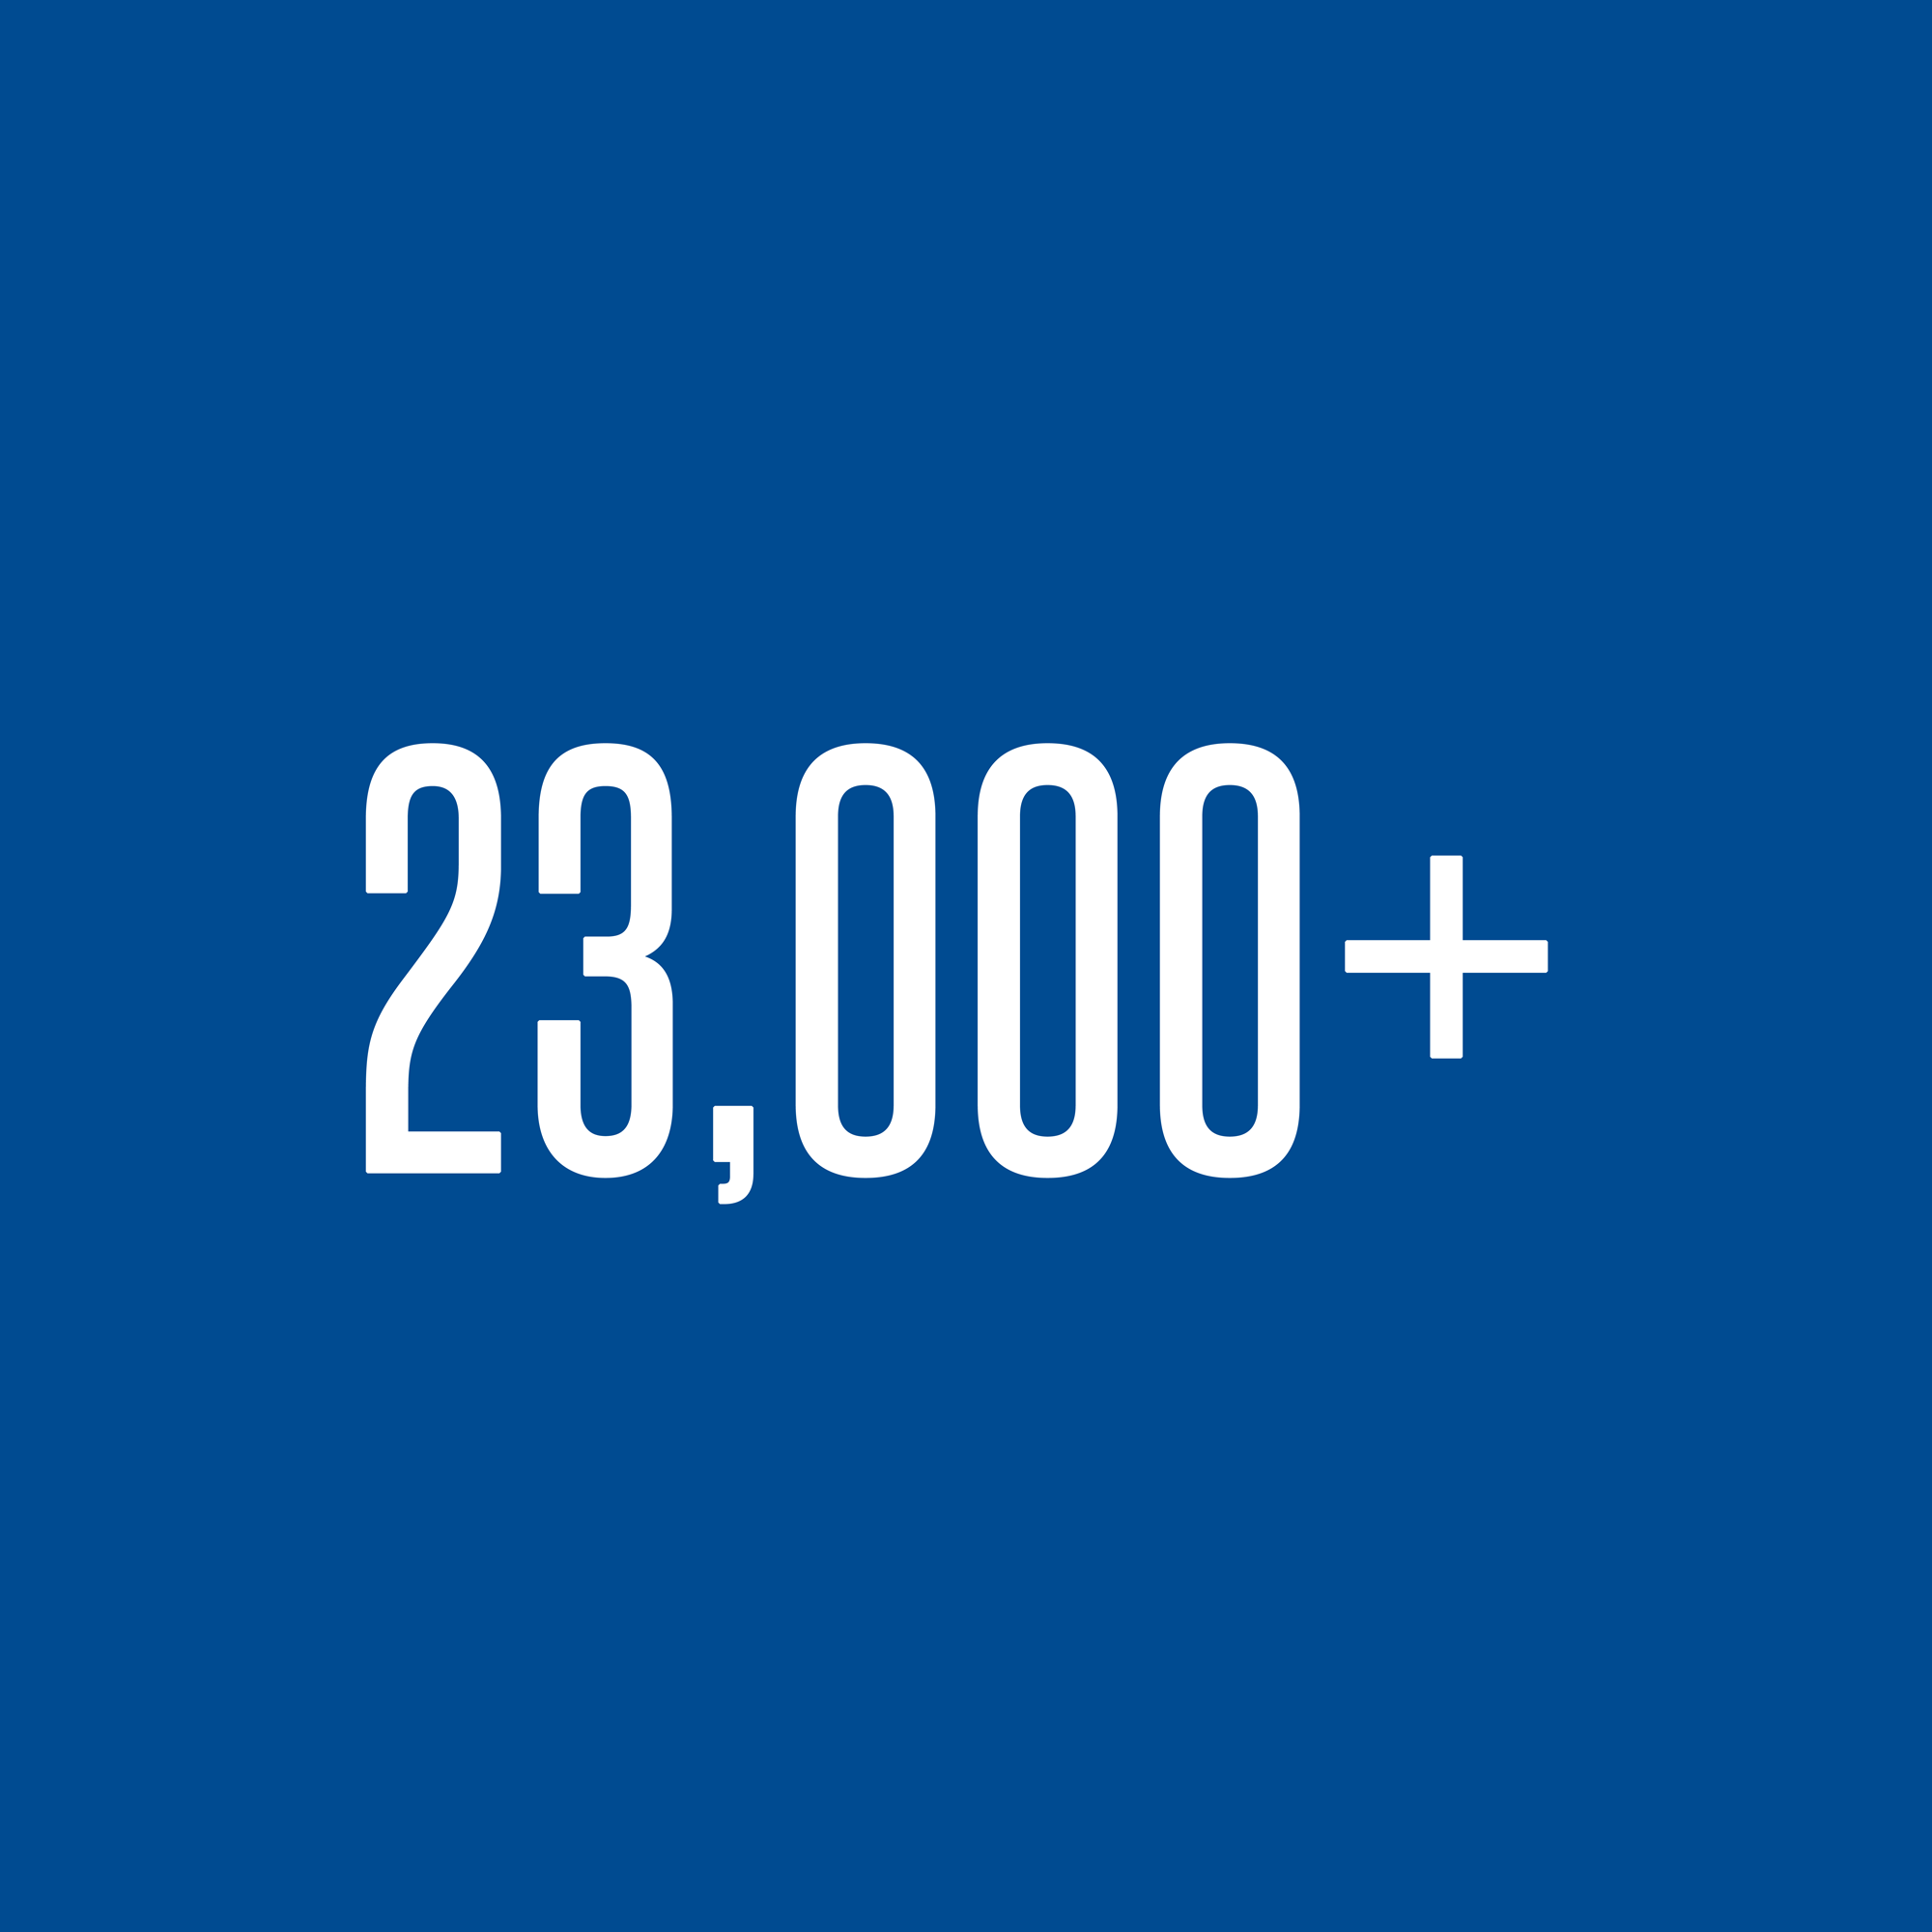 23,000+